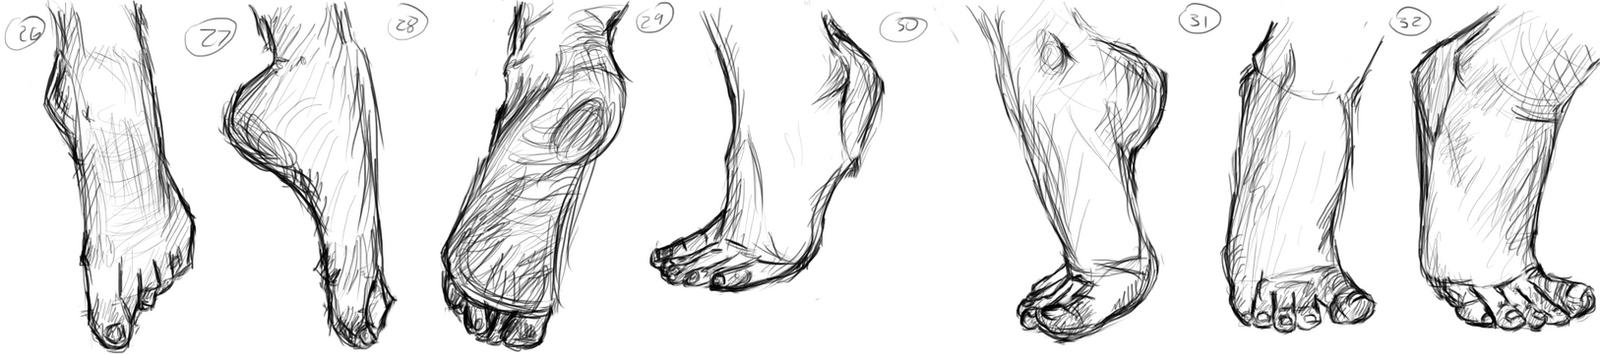 Feet (26-32) by muslacrima